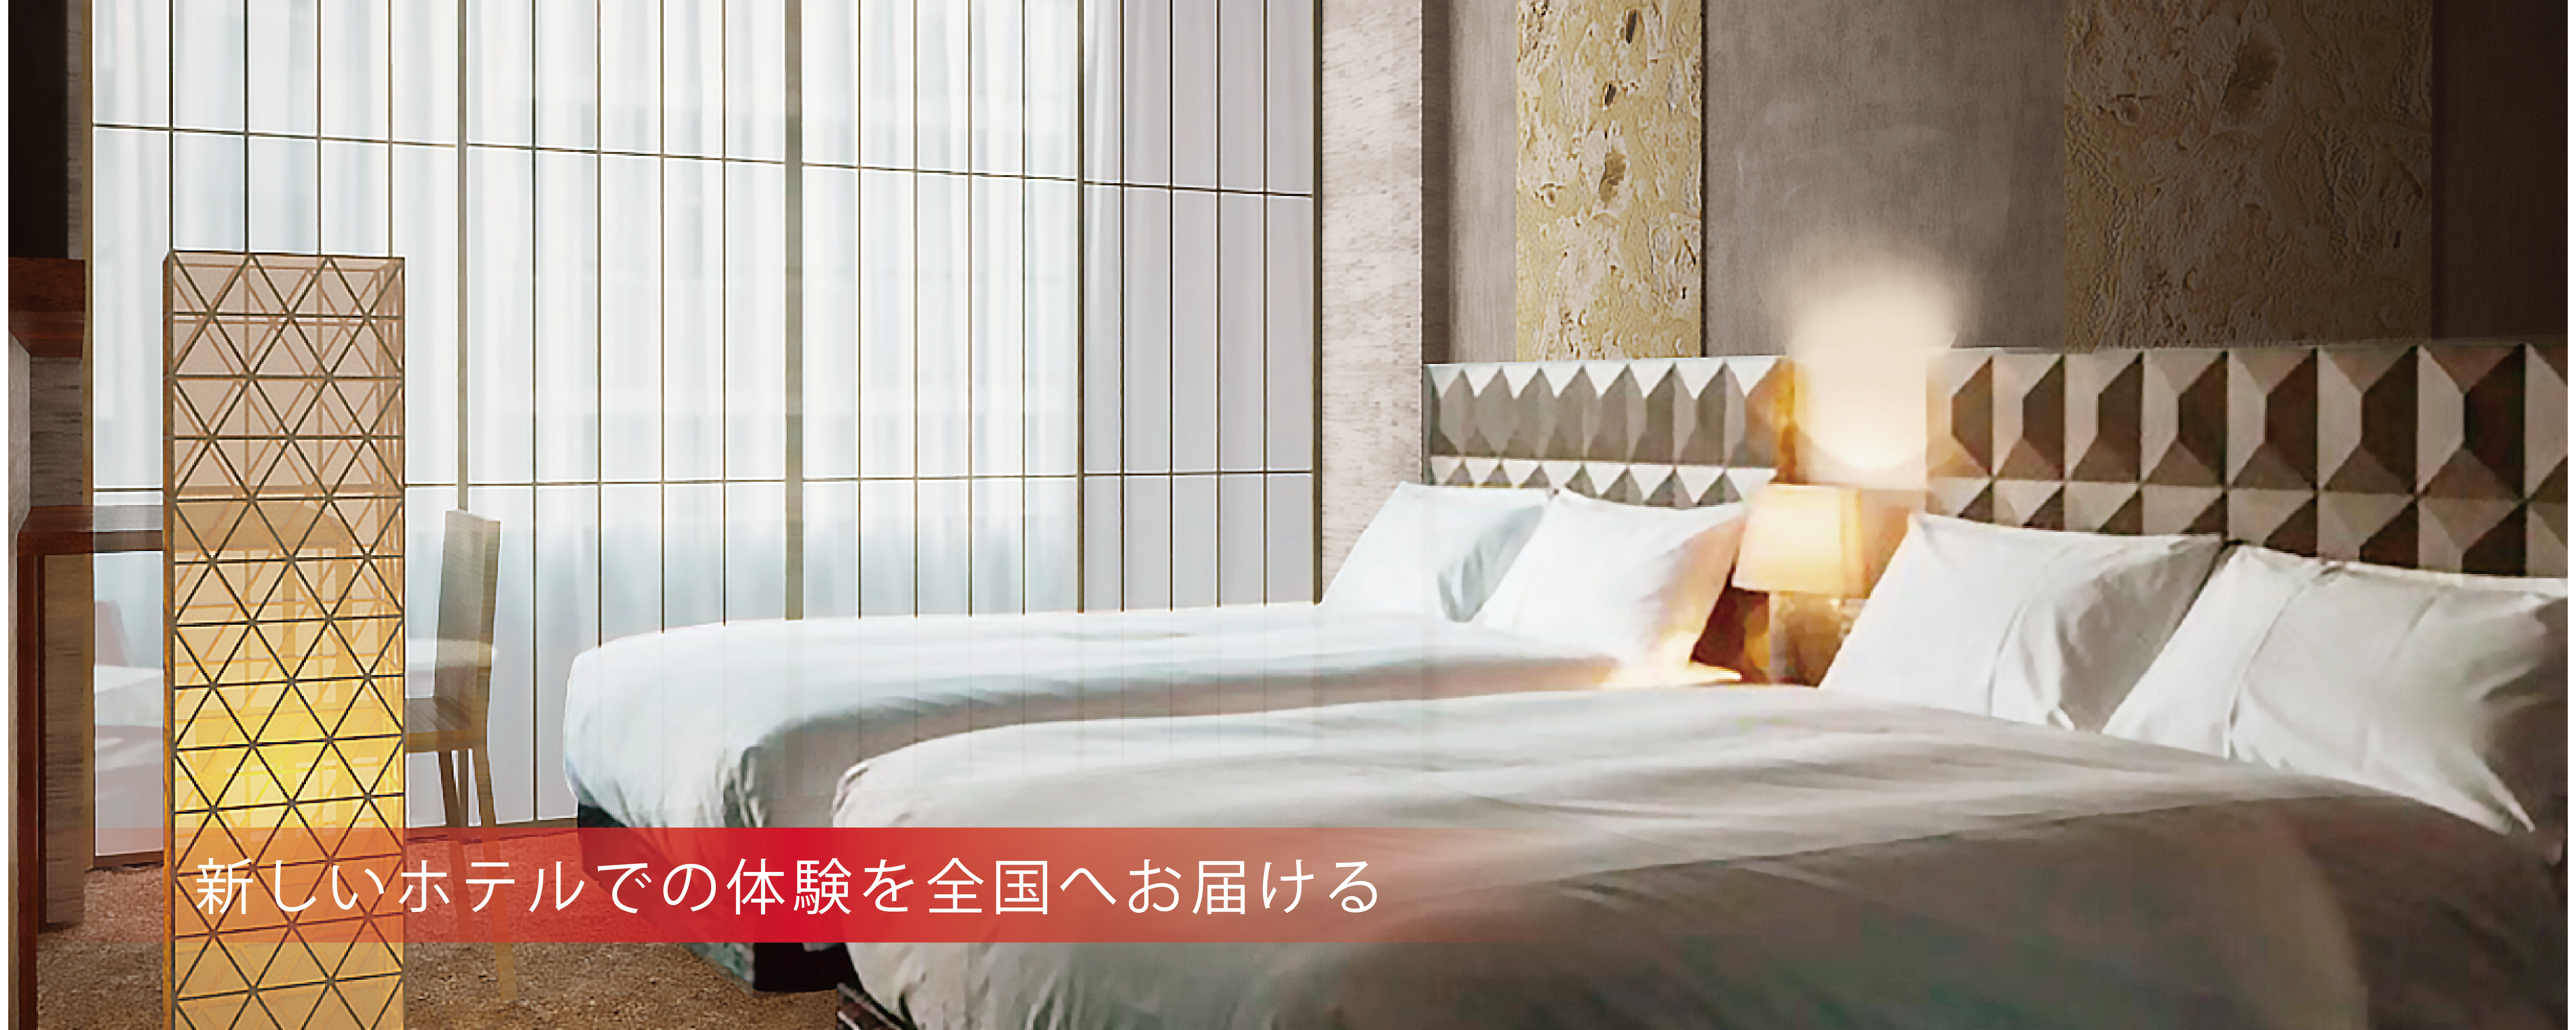 home banner1_JP